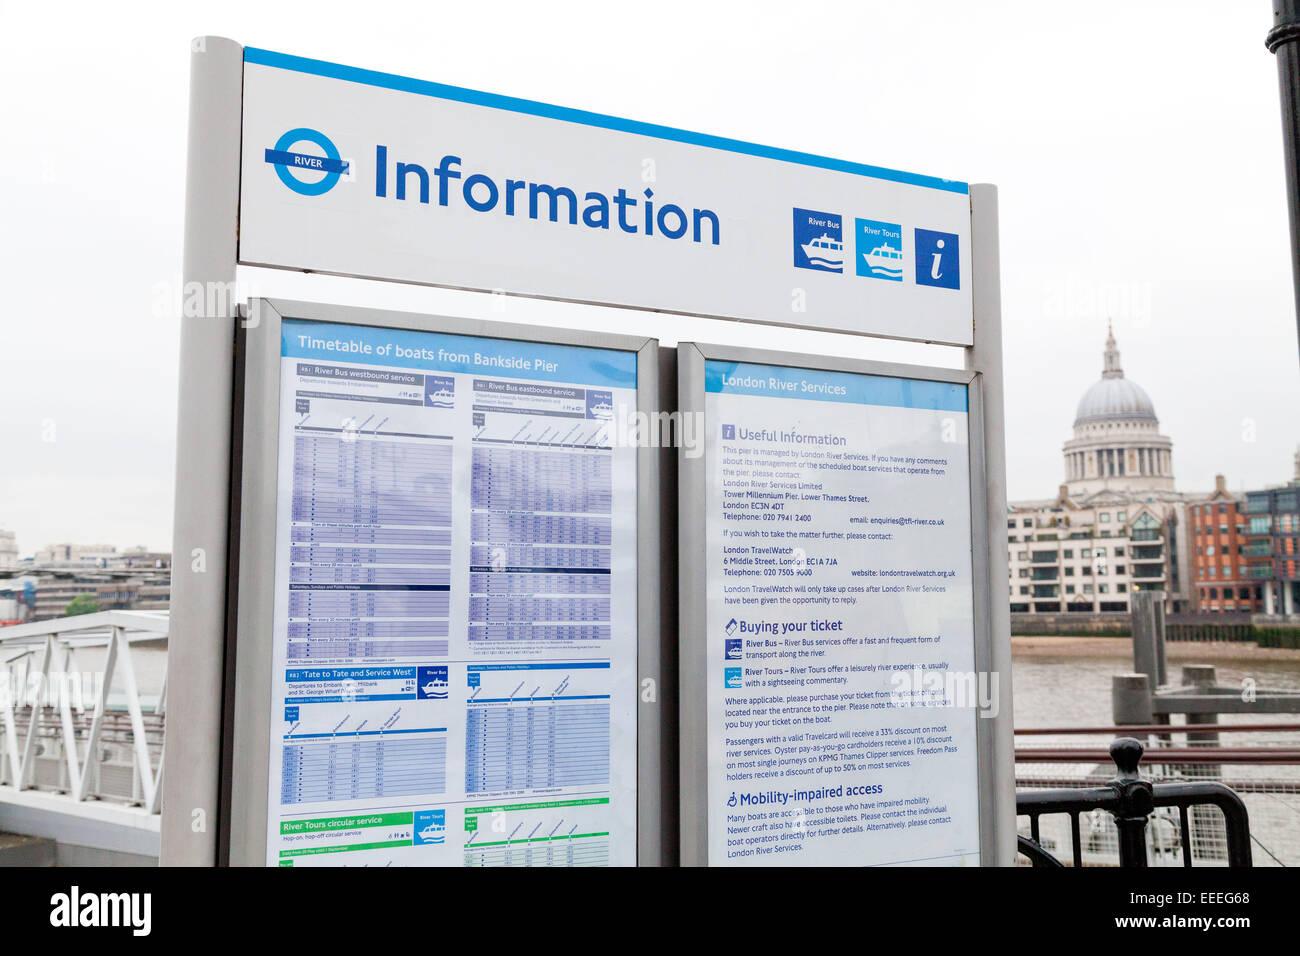 Timetables at Bankside Pier - Stock Image